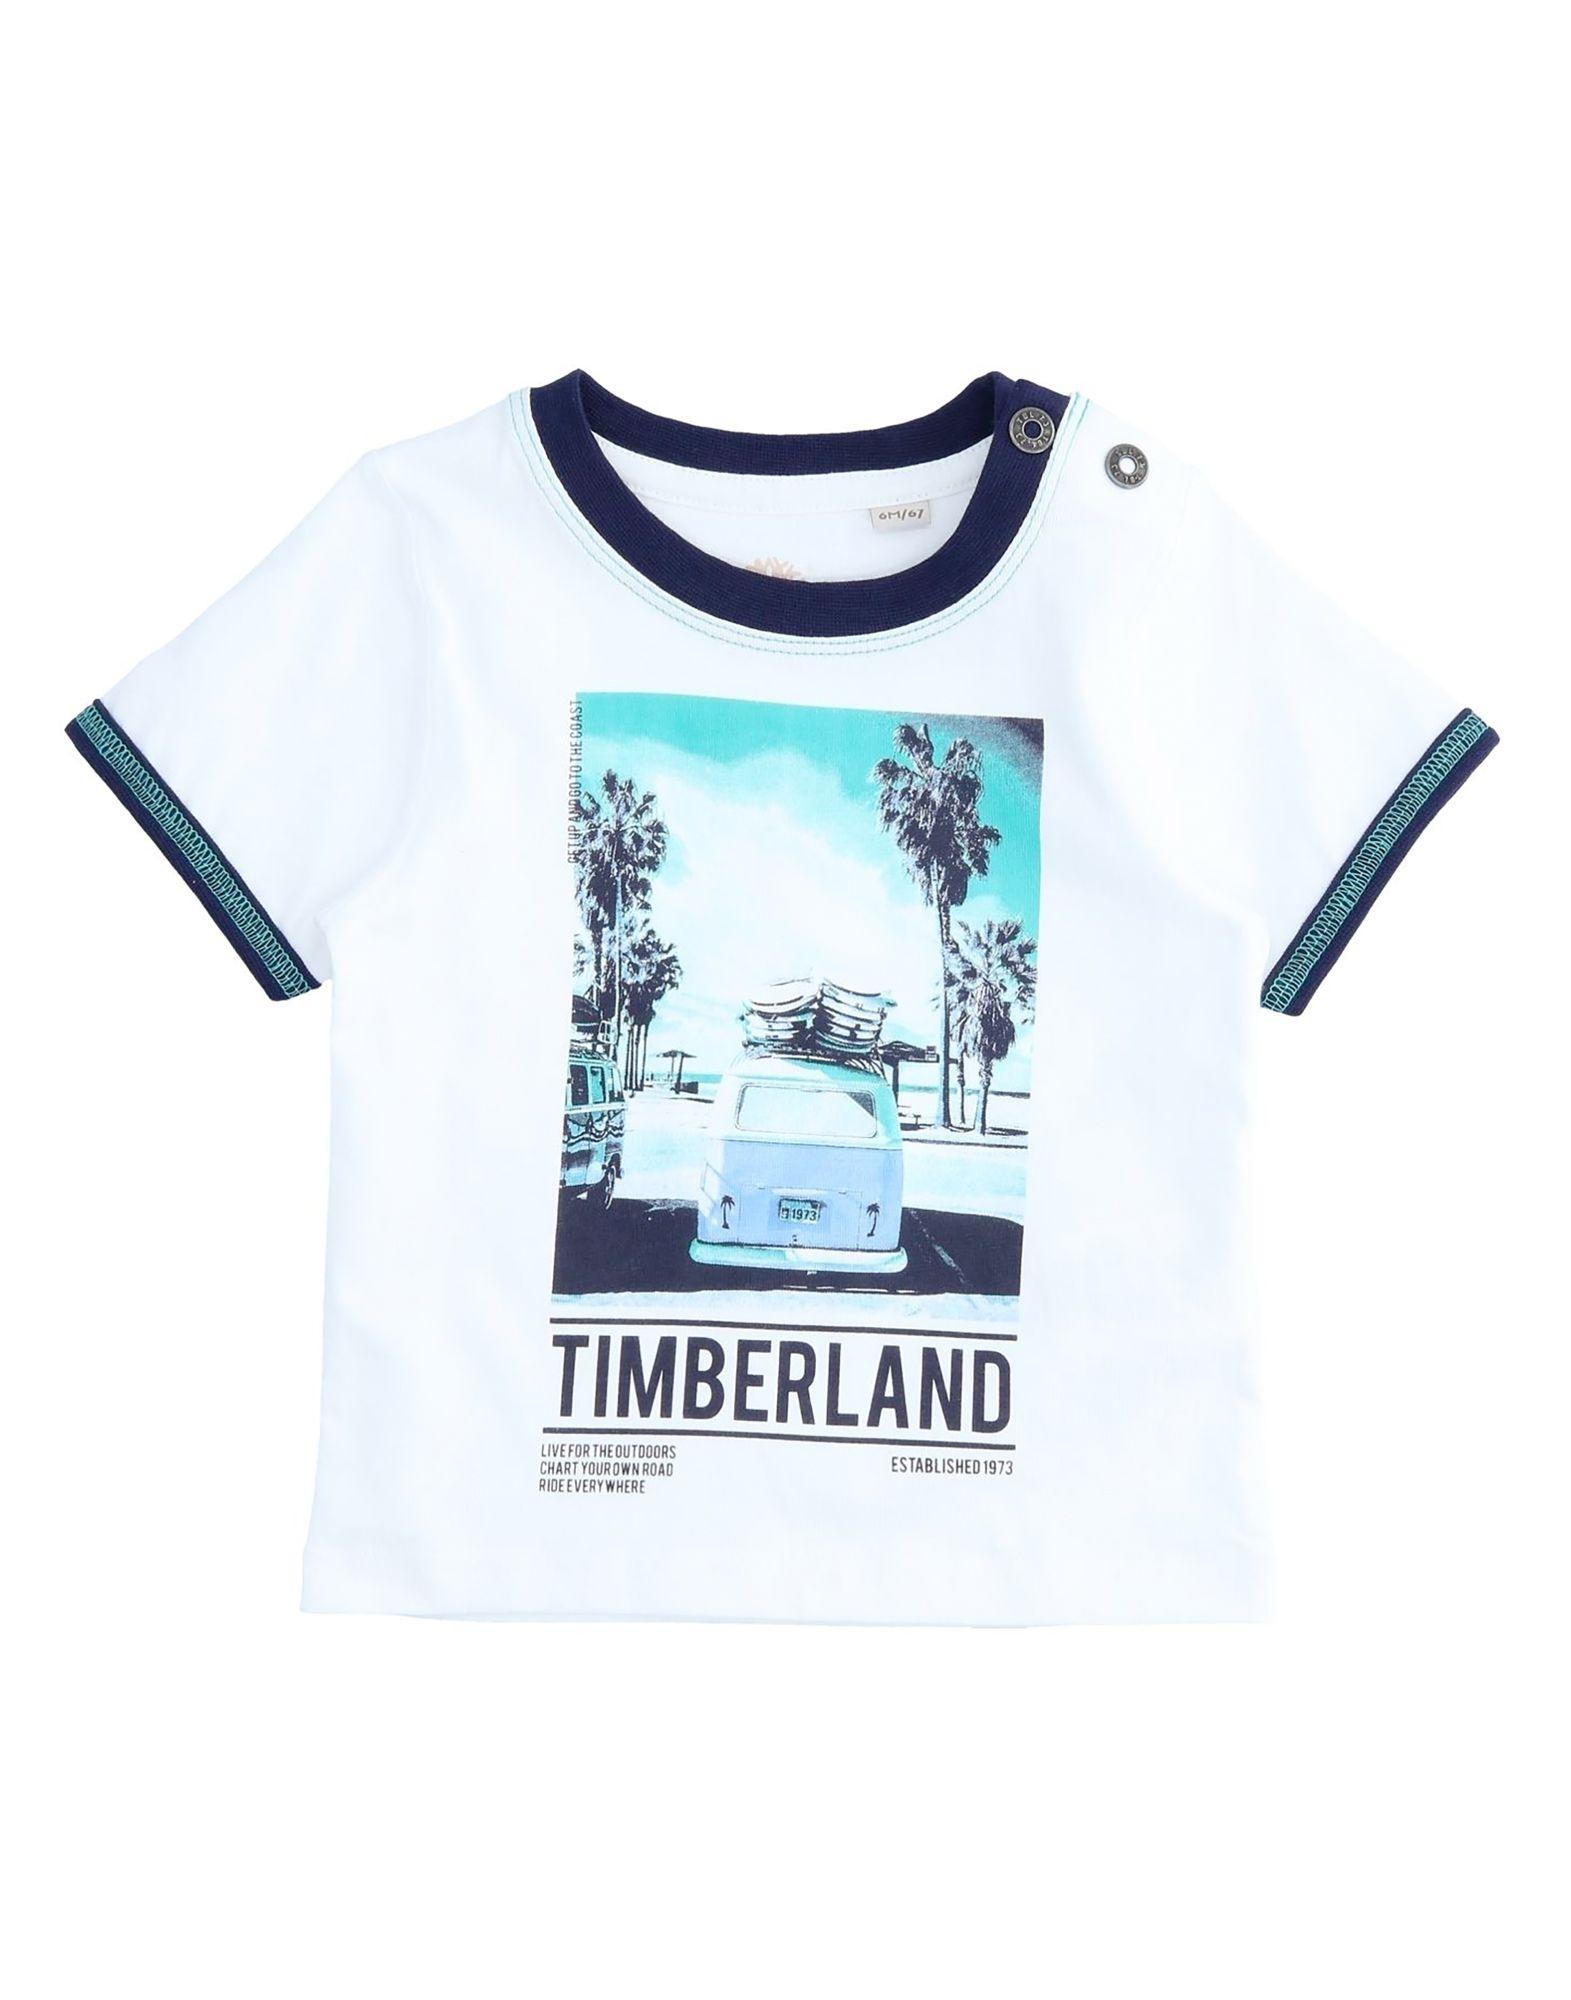 Timberland - Topwear - T-shirts - On Yoox.com